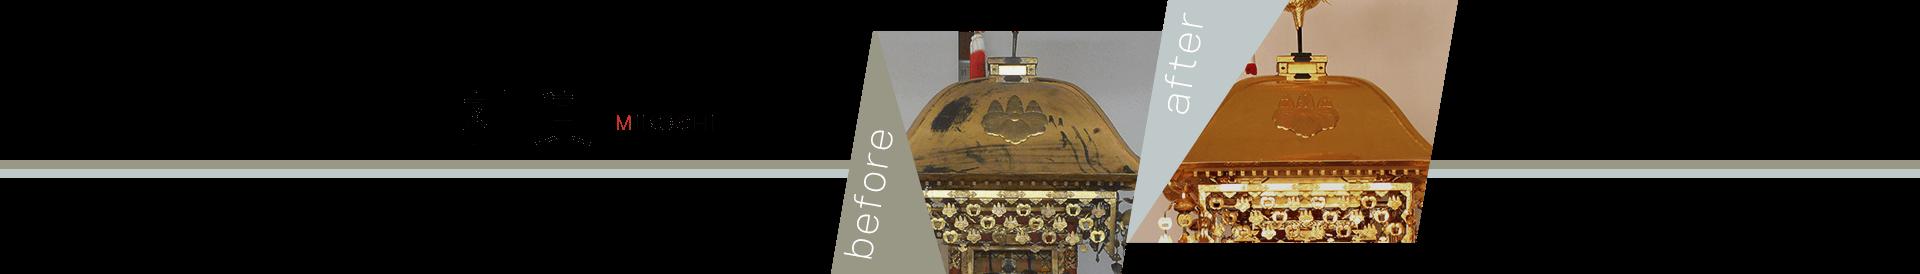 神輿の修理・修復